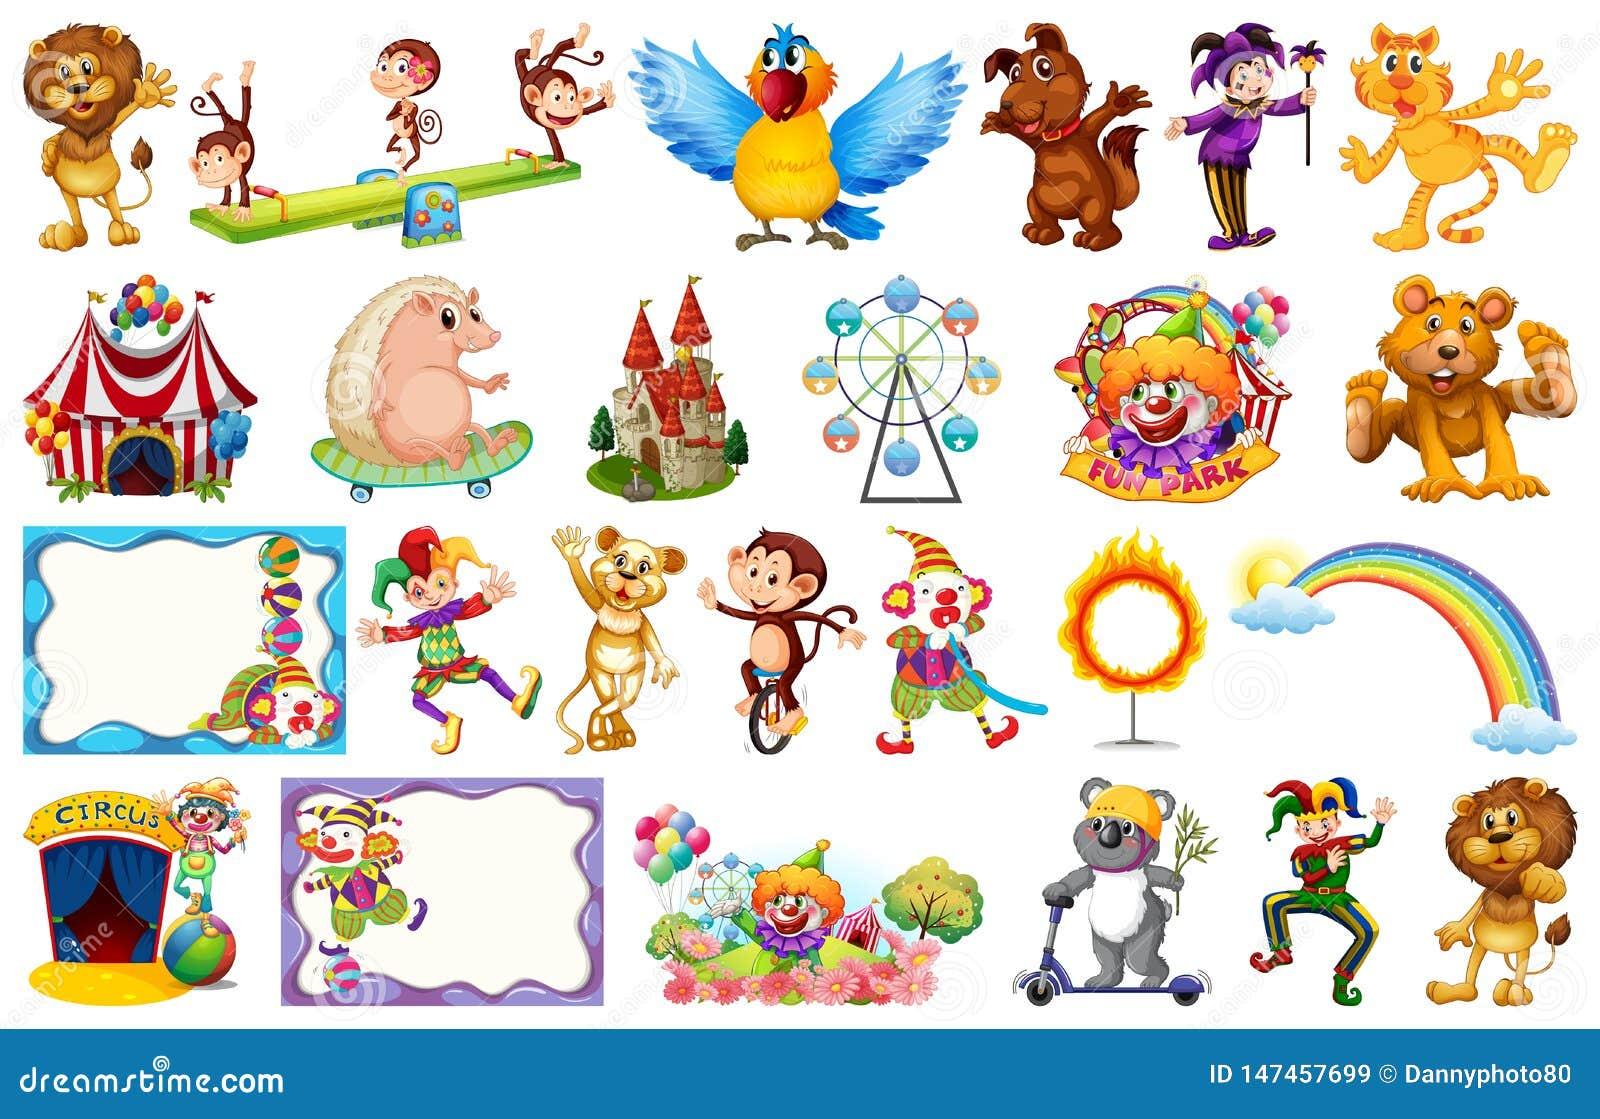 Animal Circus Carnival Clip Art | Pre-Designed Photoshop Graphics ~  Creative Market